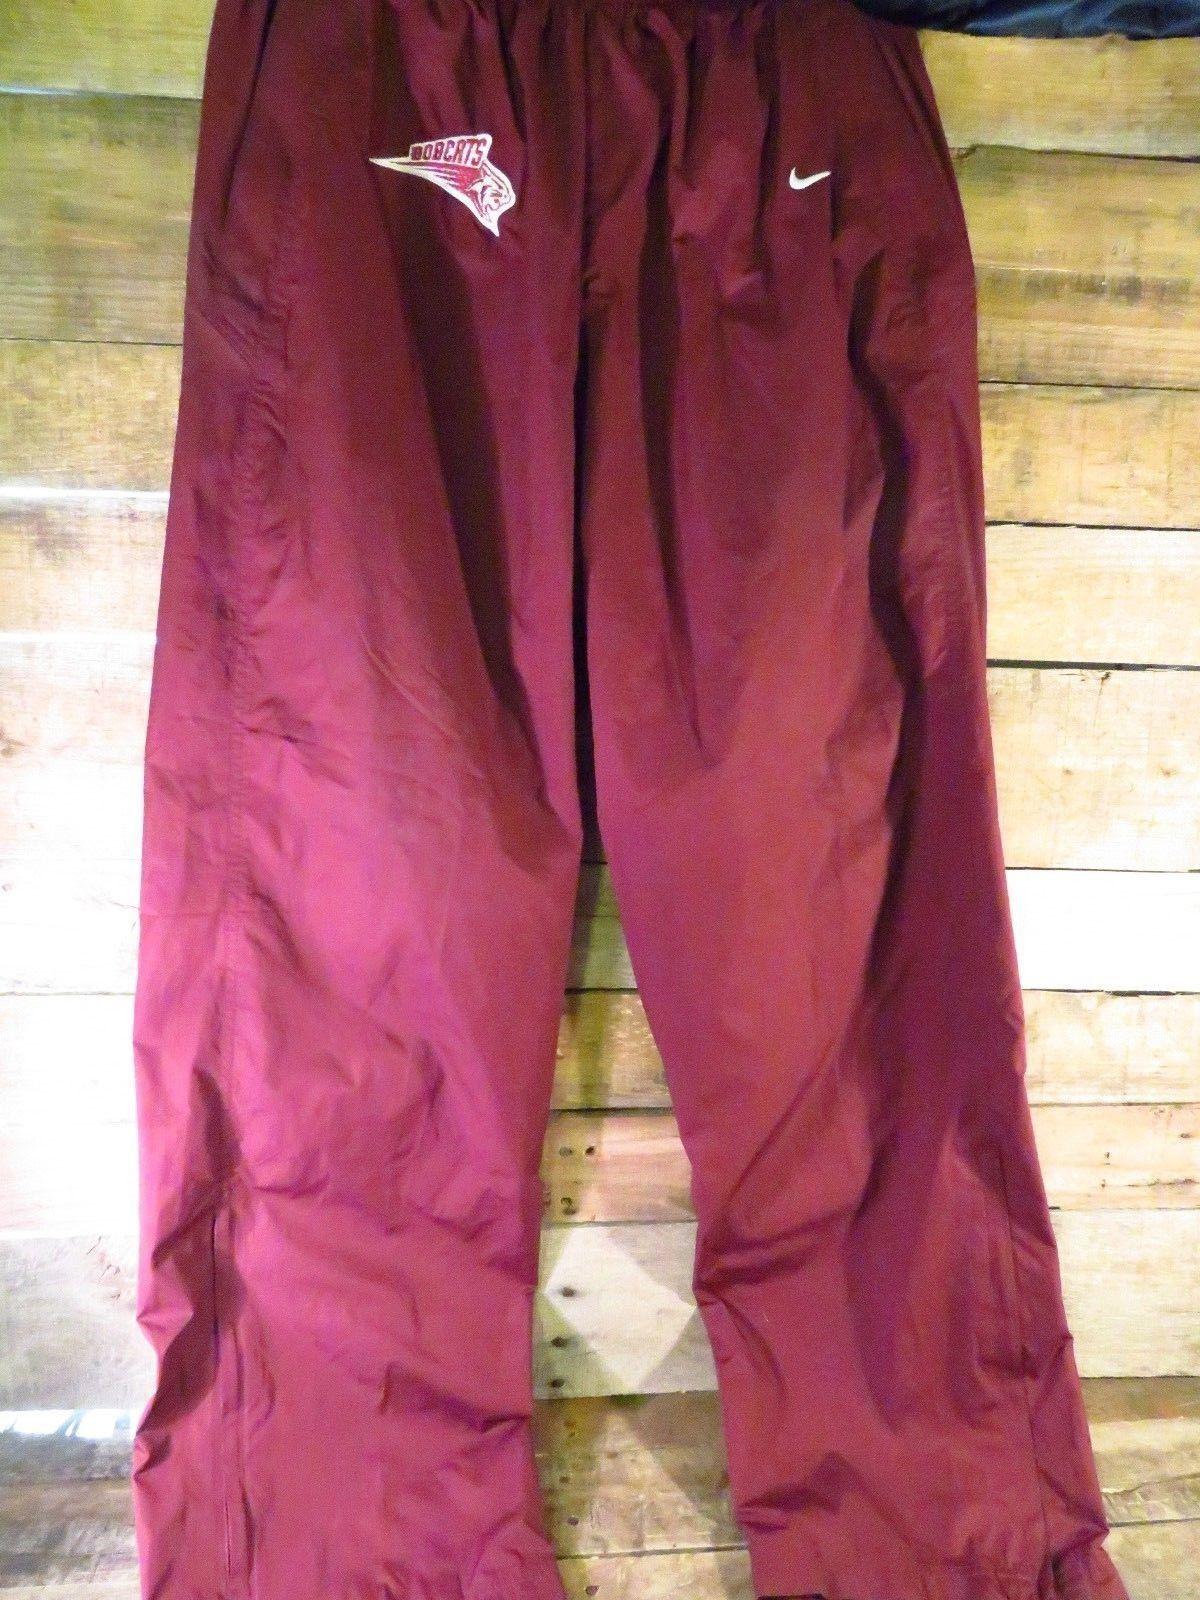 3xl 4xl Nike Arizona Cardinals Storm-fit Suit Jacket Customers First Pants Red Nfl Rare New